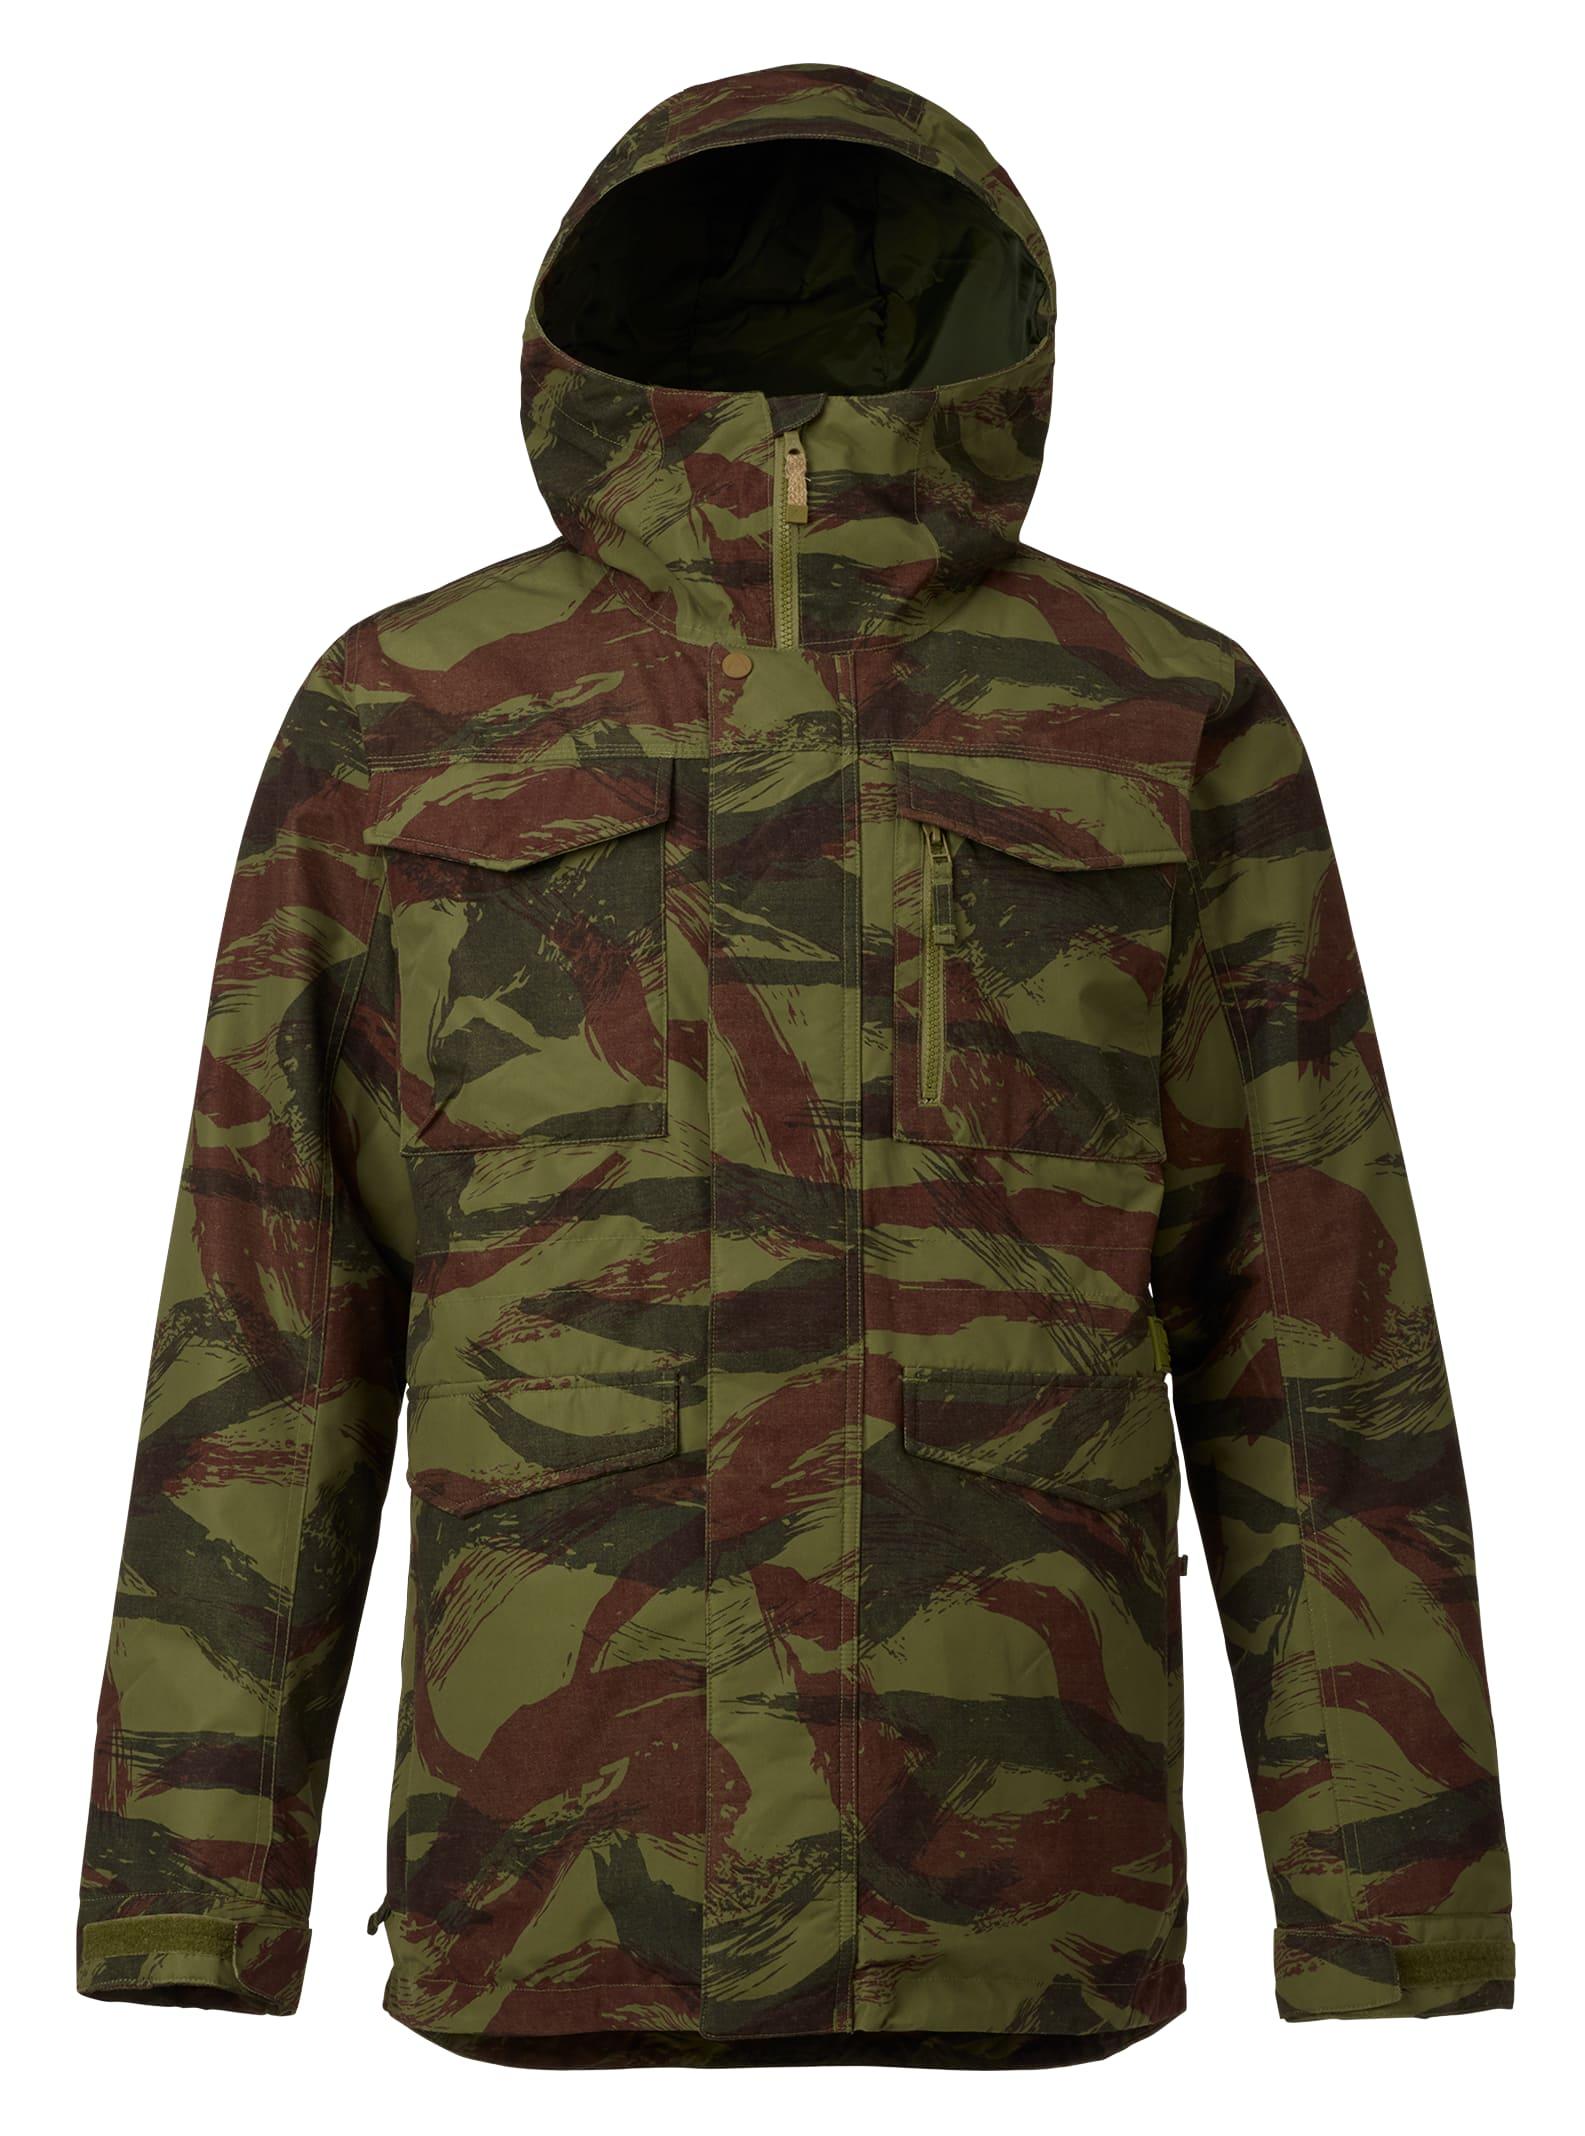 dbb1a48a Men's Burton Covert Jacket | Burton Snowboards Winter 2018